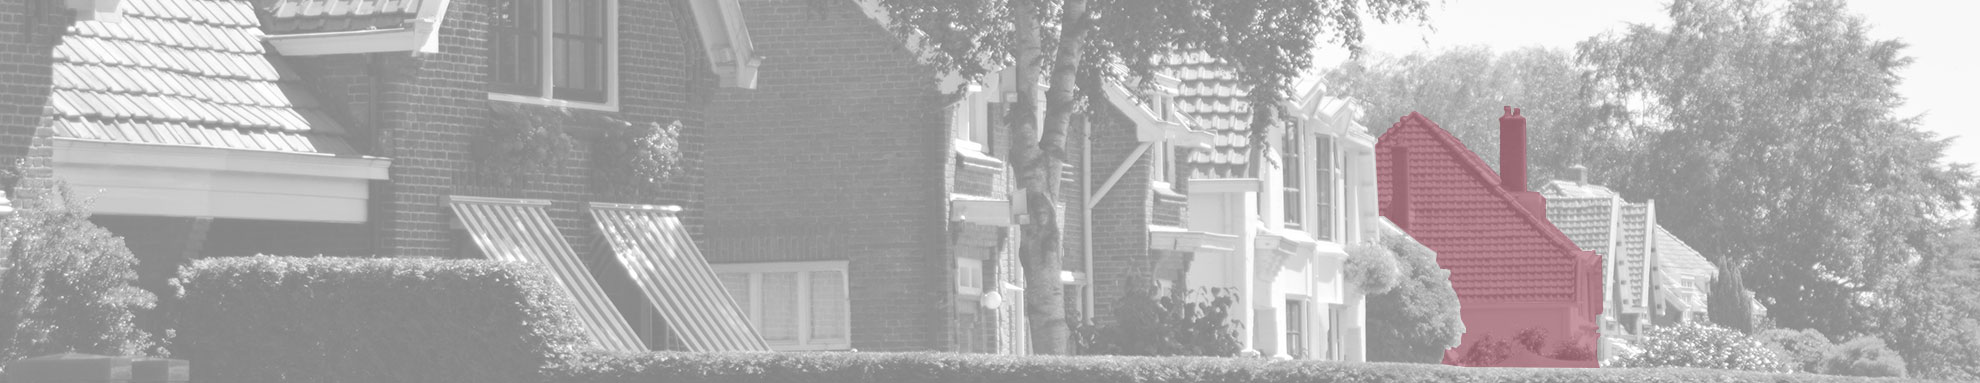 Preventass b.v. Veenendaal Hypotheek verzekering